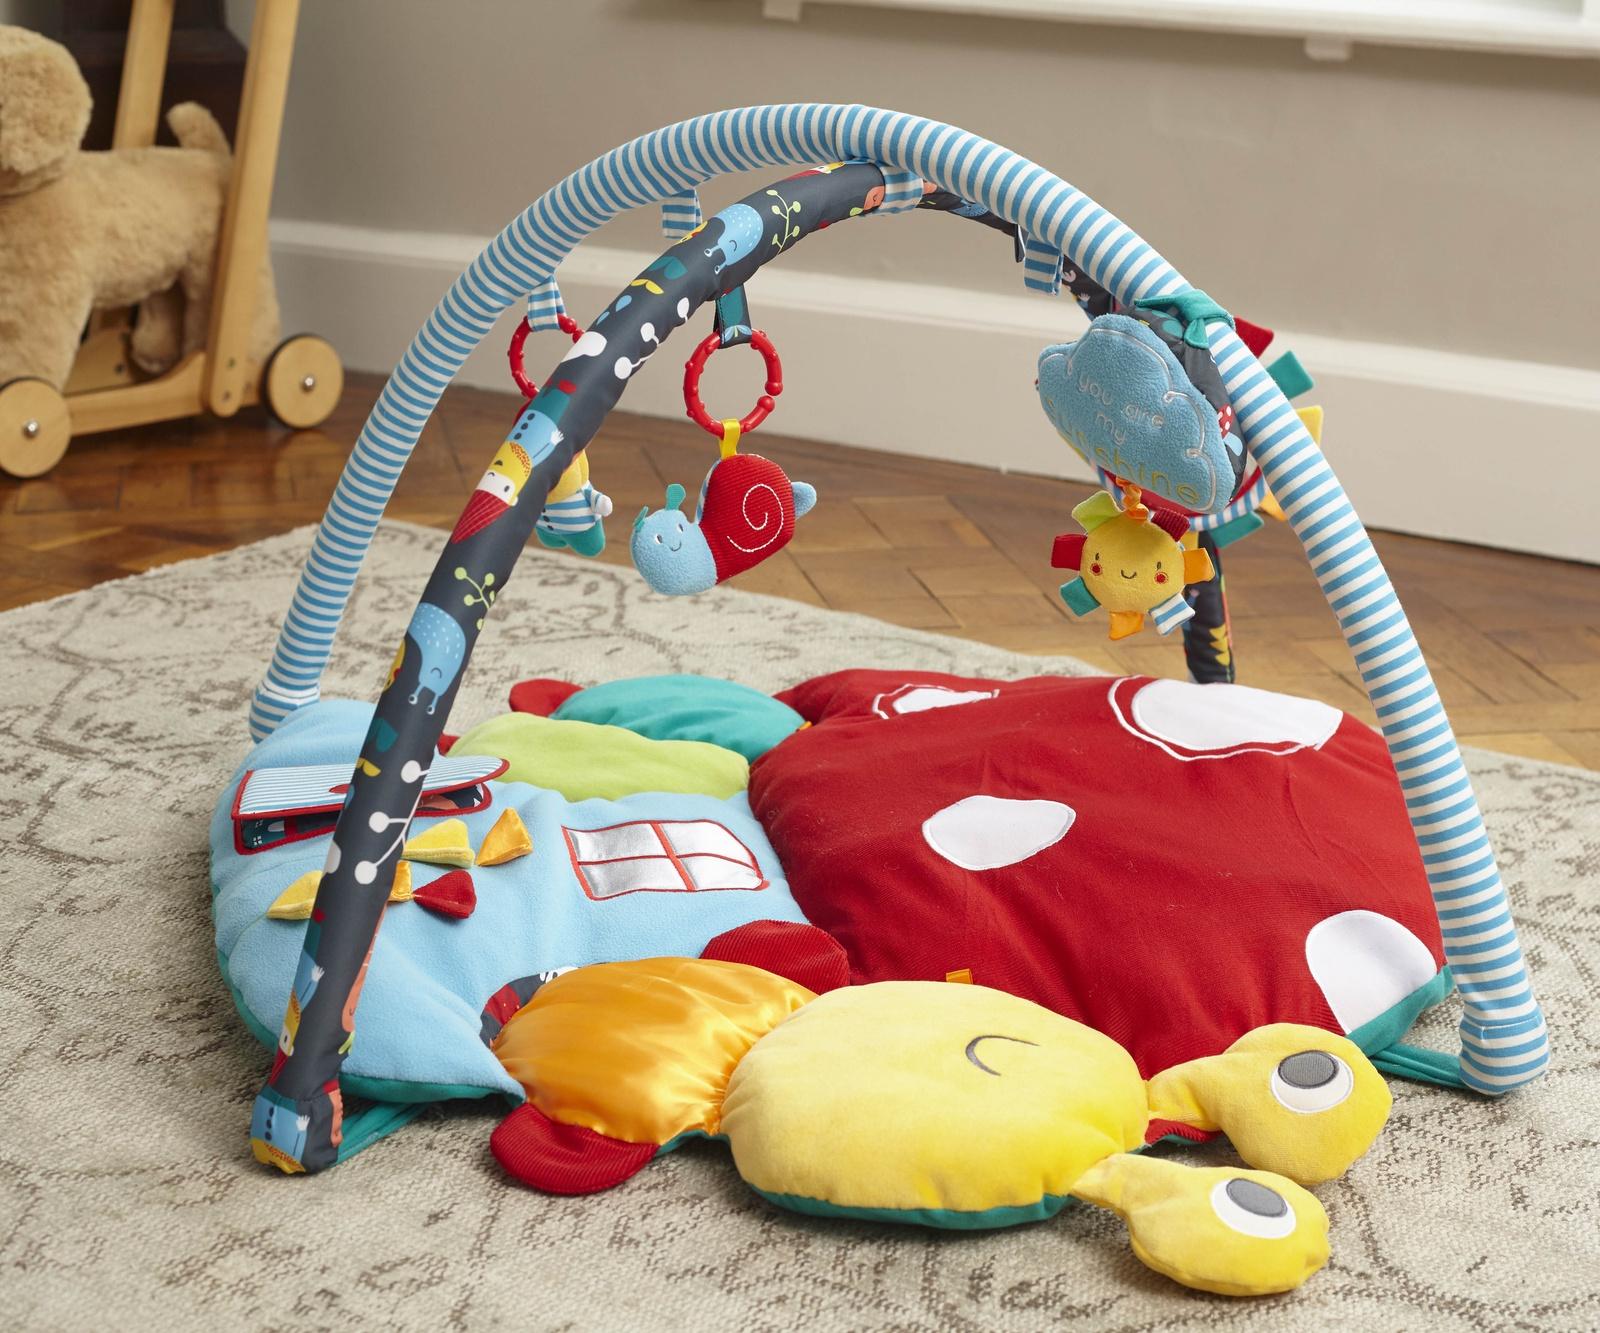 Развивающий коврик для малыша картинки